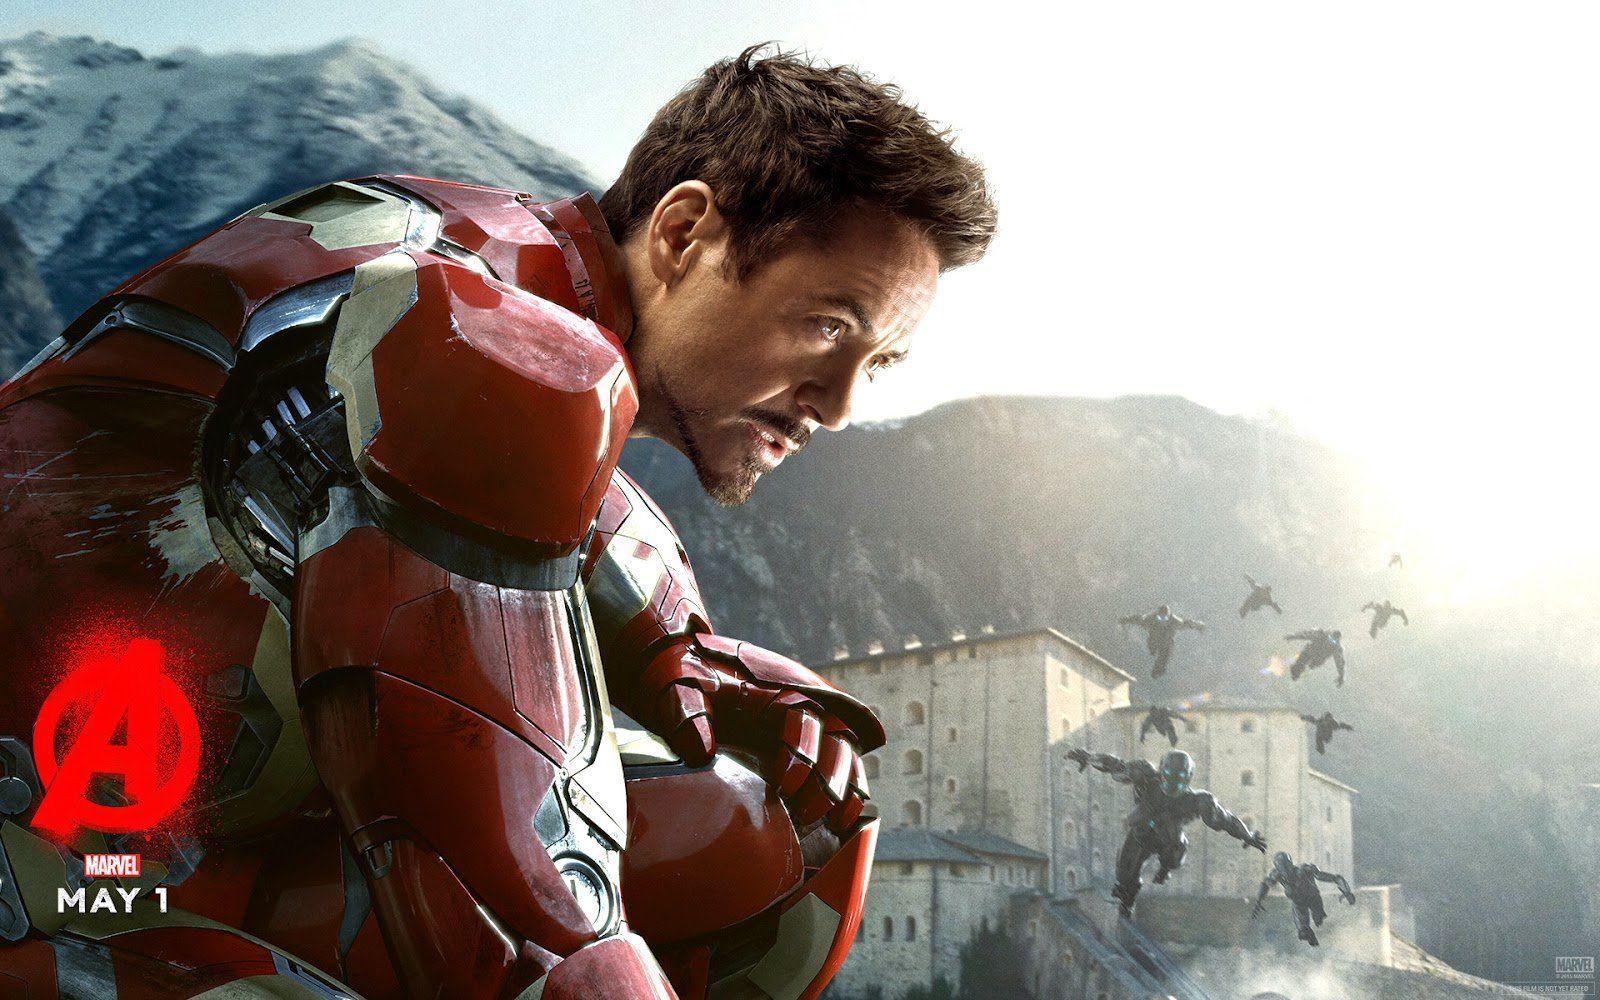 Avengers Age Of Ultron Iron Man Wallpaper Phone Desktop Wallpaper Box Age Of Ultron Avengers Age Robert Downey Jr Iron man age of ultron wallpaper